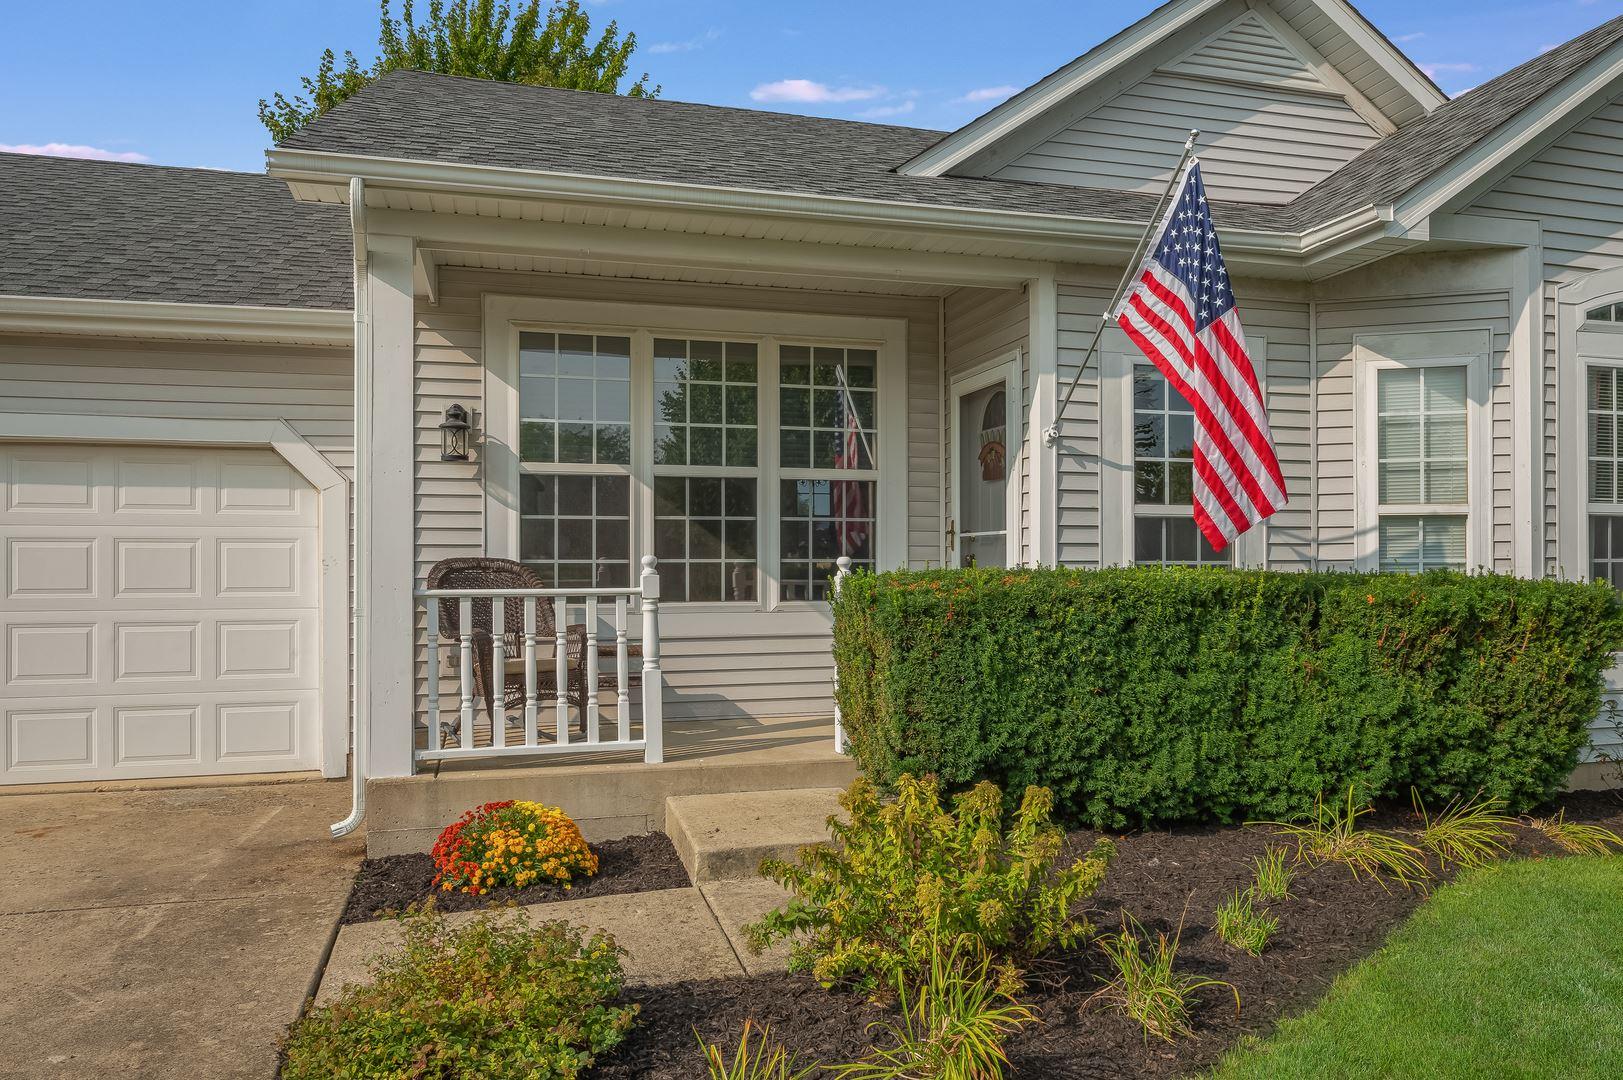 Photo of 503 Heritage Drive, Oswego, IL 60543 (MLS # 10860103)